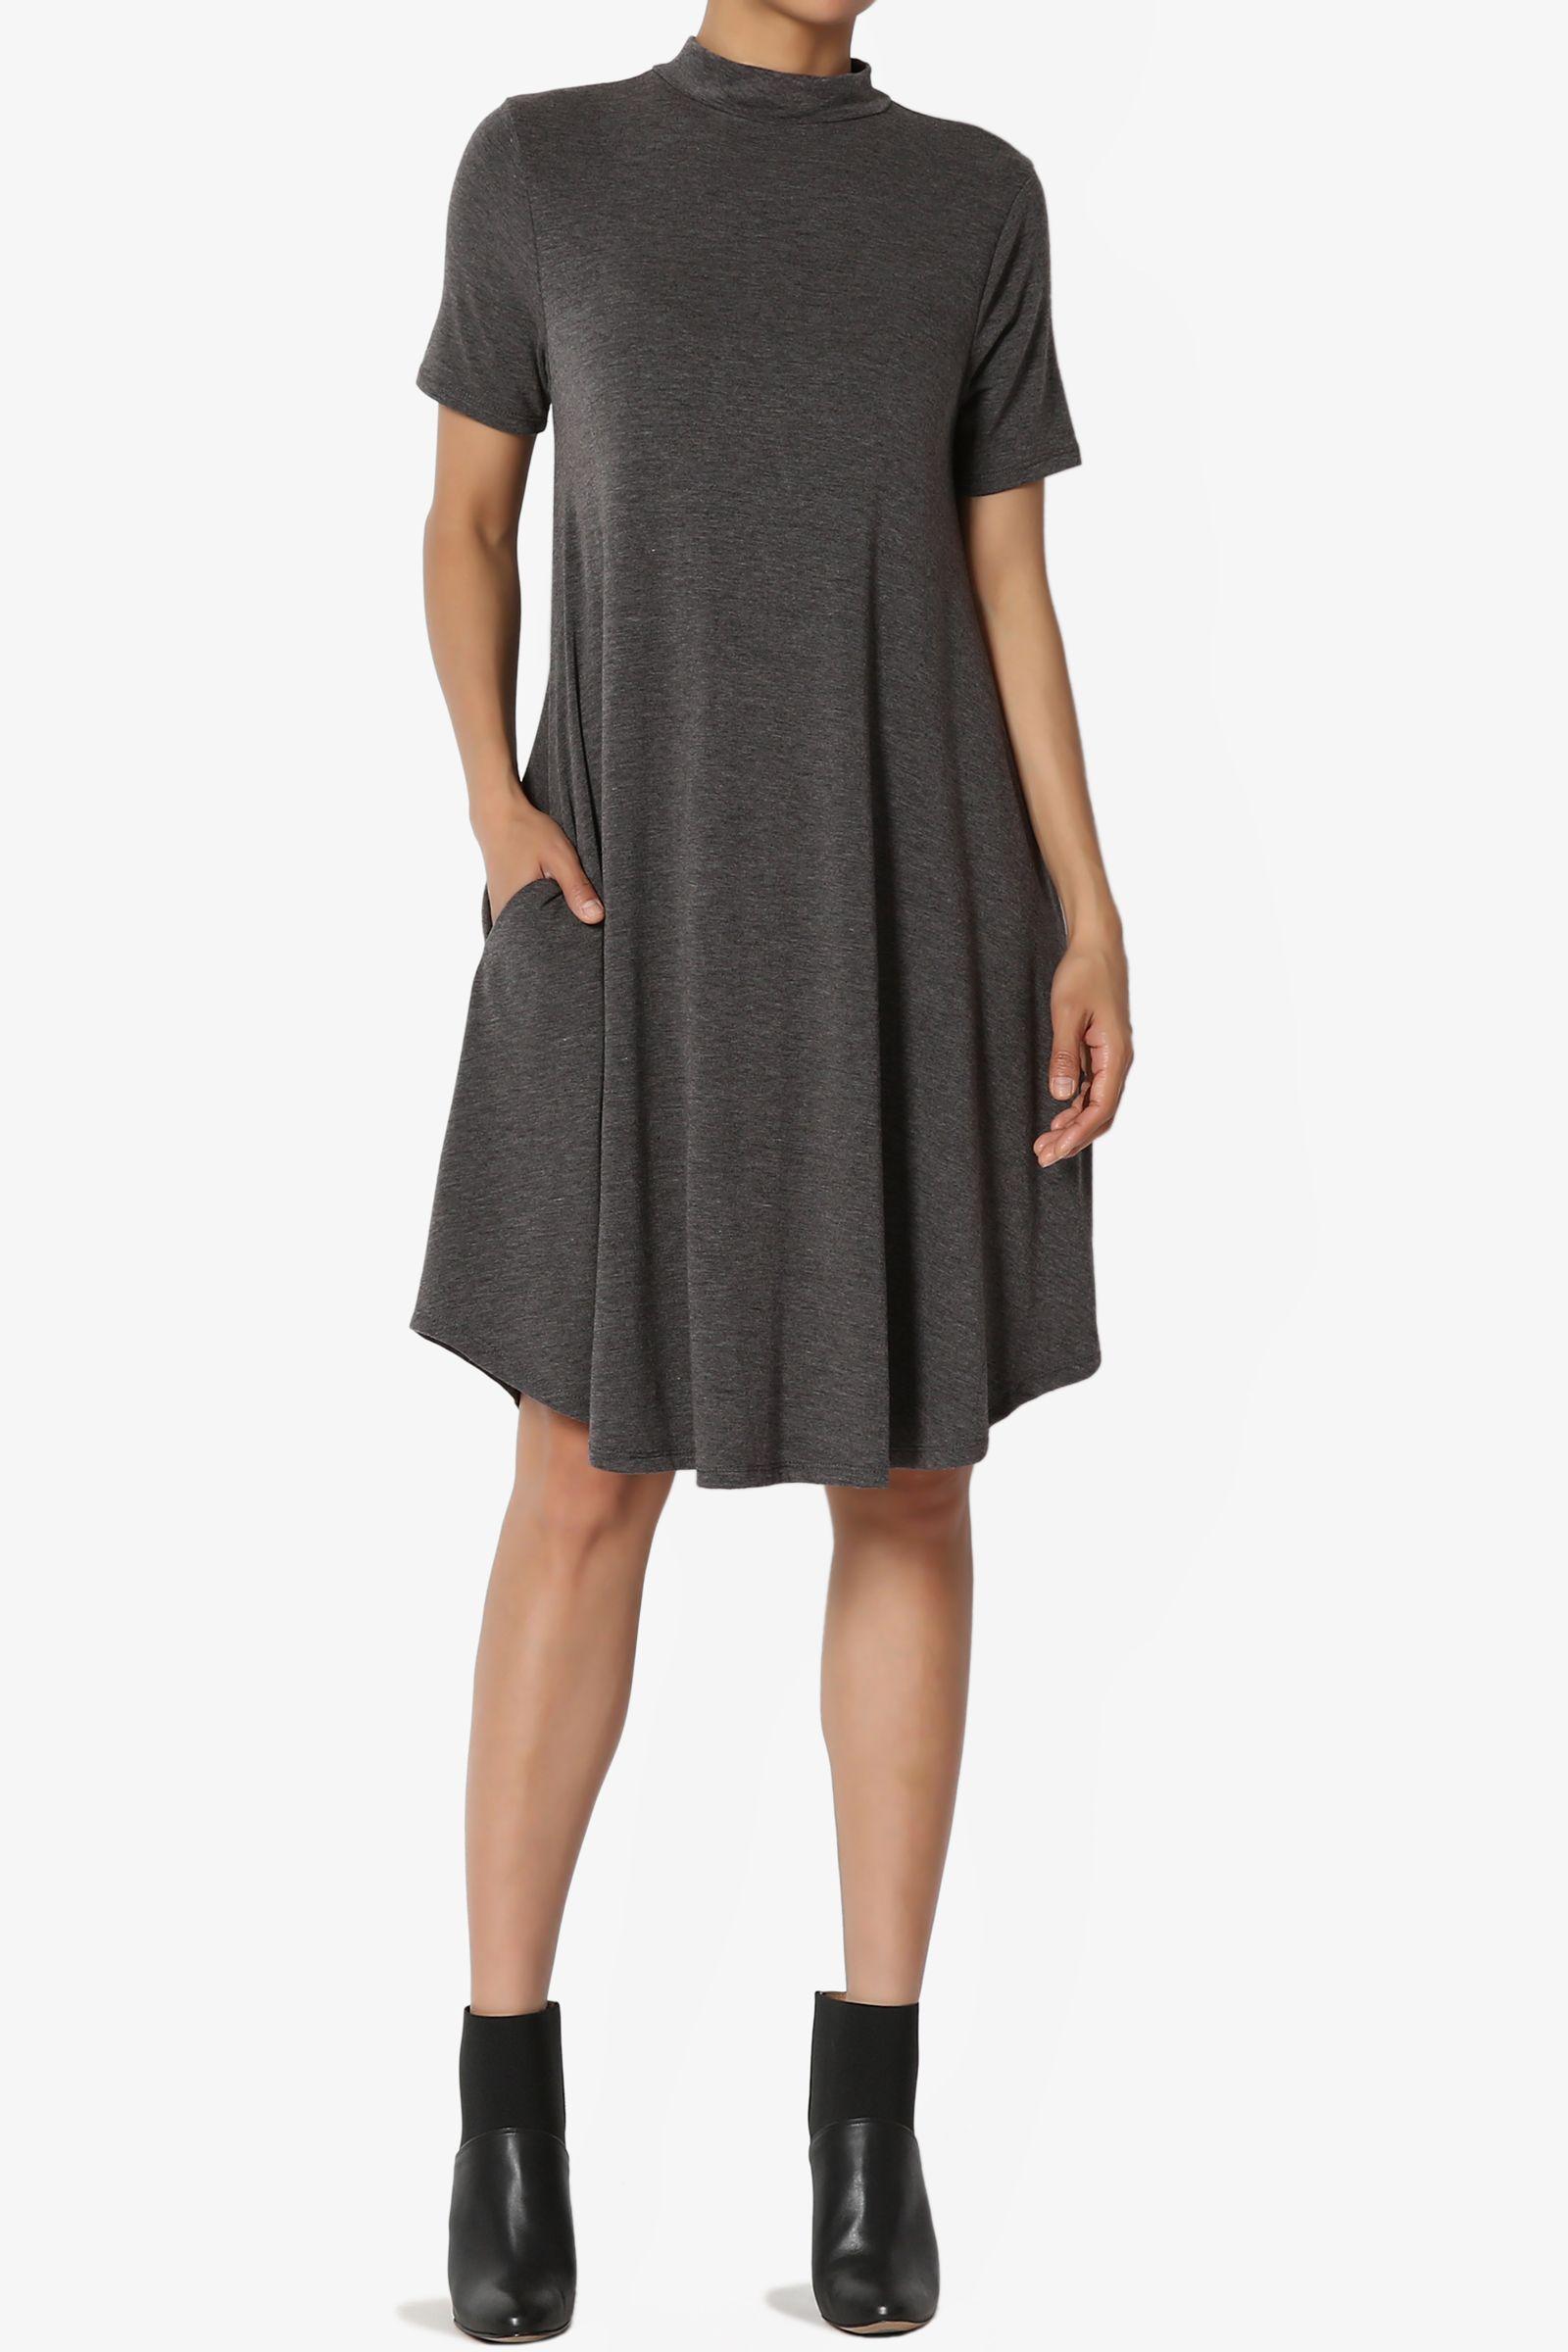 Themogan Themogan Women S Short Sleeve Mock Neck Jersey Fit Flare Midi Dress W Pocket Walmart Com Jersey Knit Dress Fit And Flared Dresses [ 2400 x 1600 Pixel ]